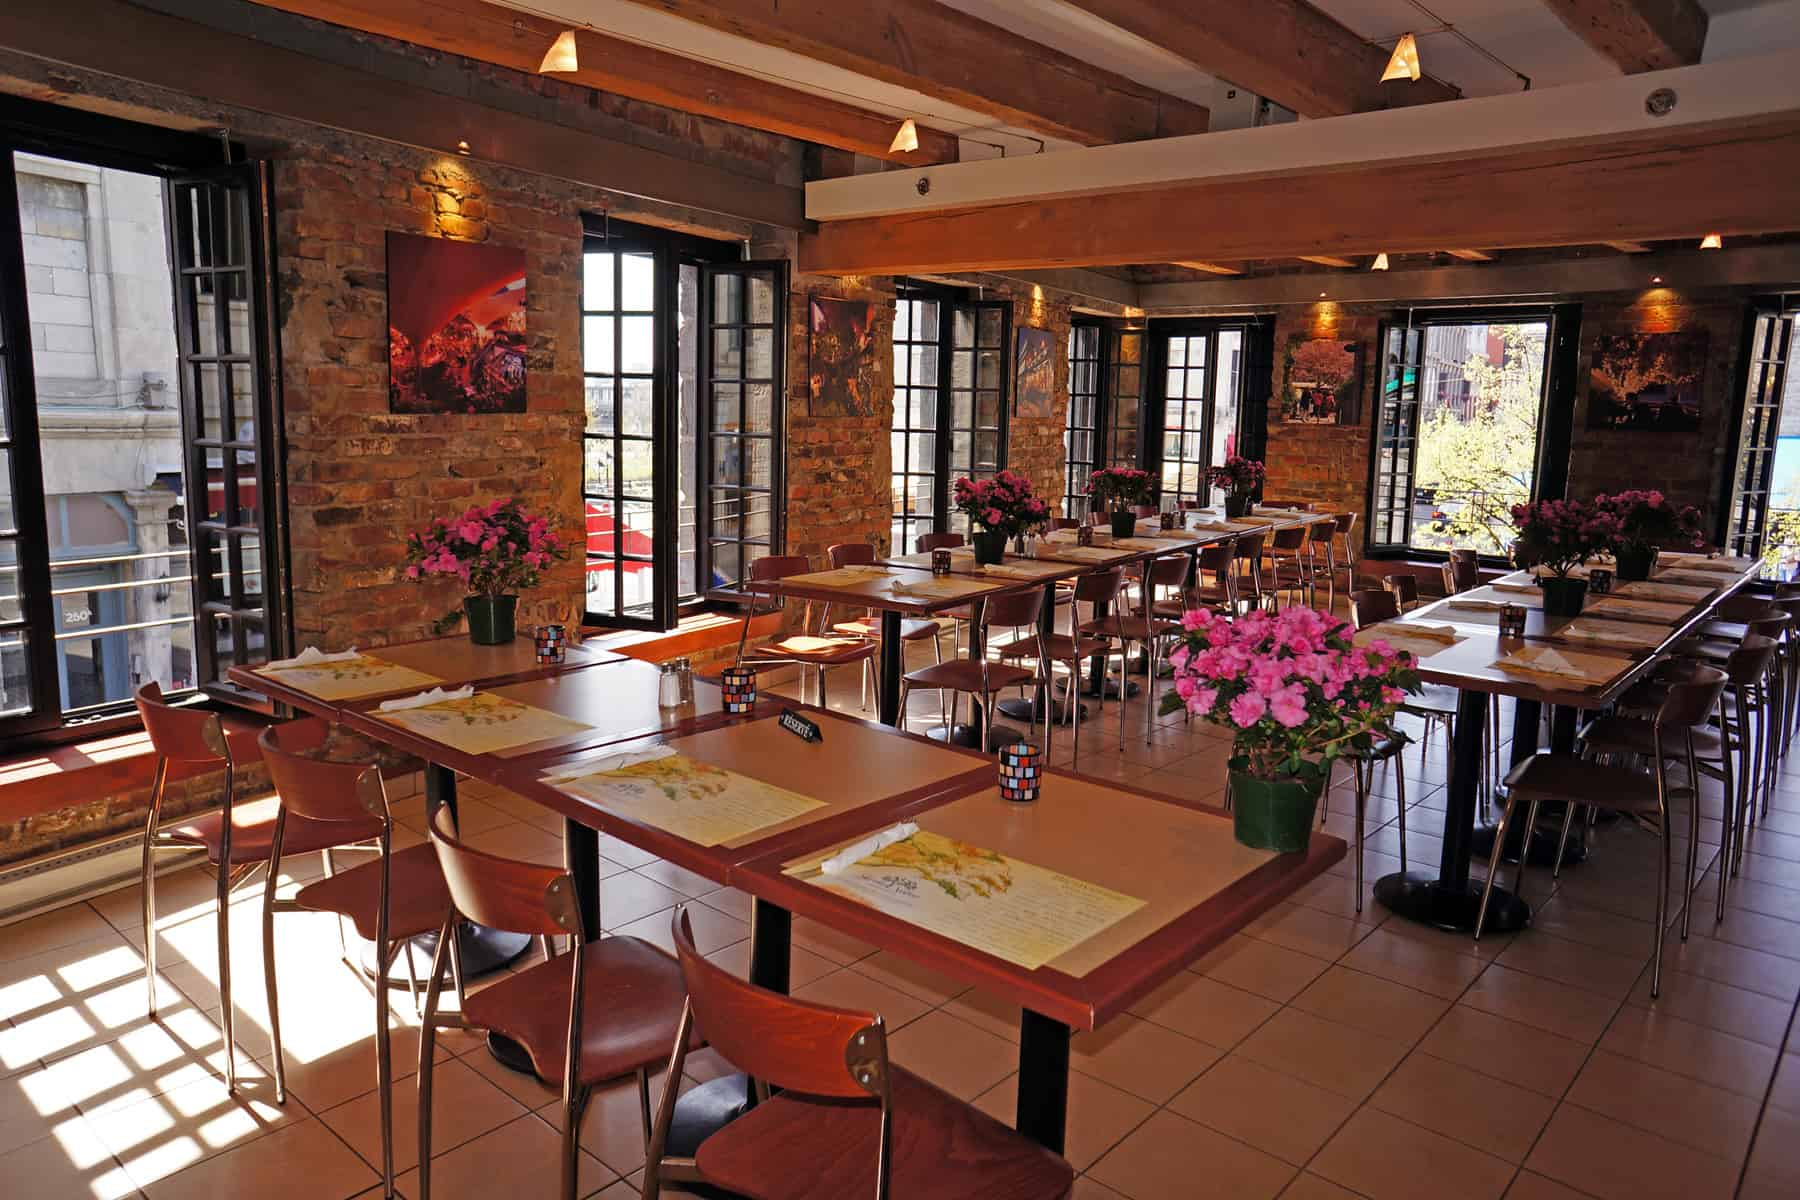 Salle cartier jardin nelson for La salle a manger montreal menu